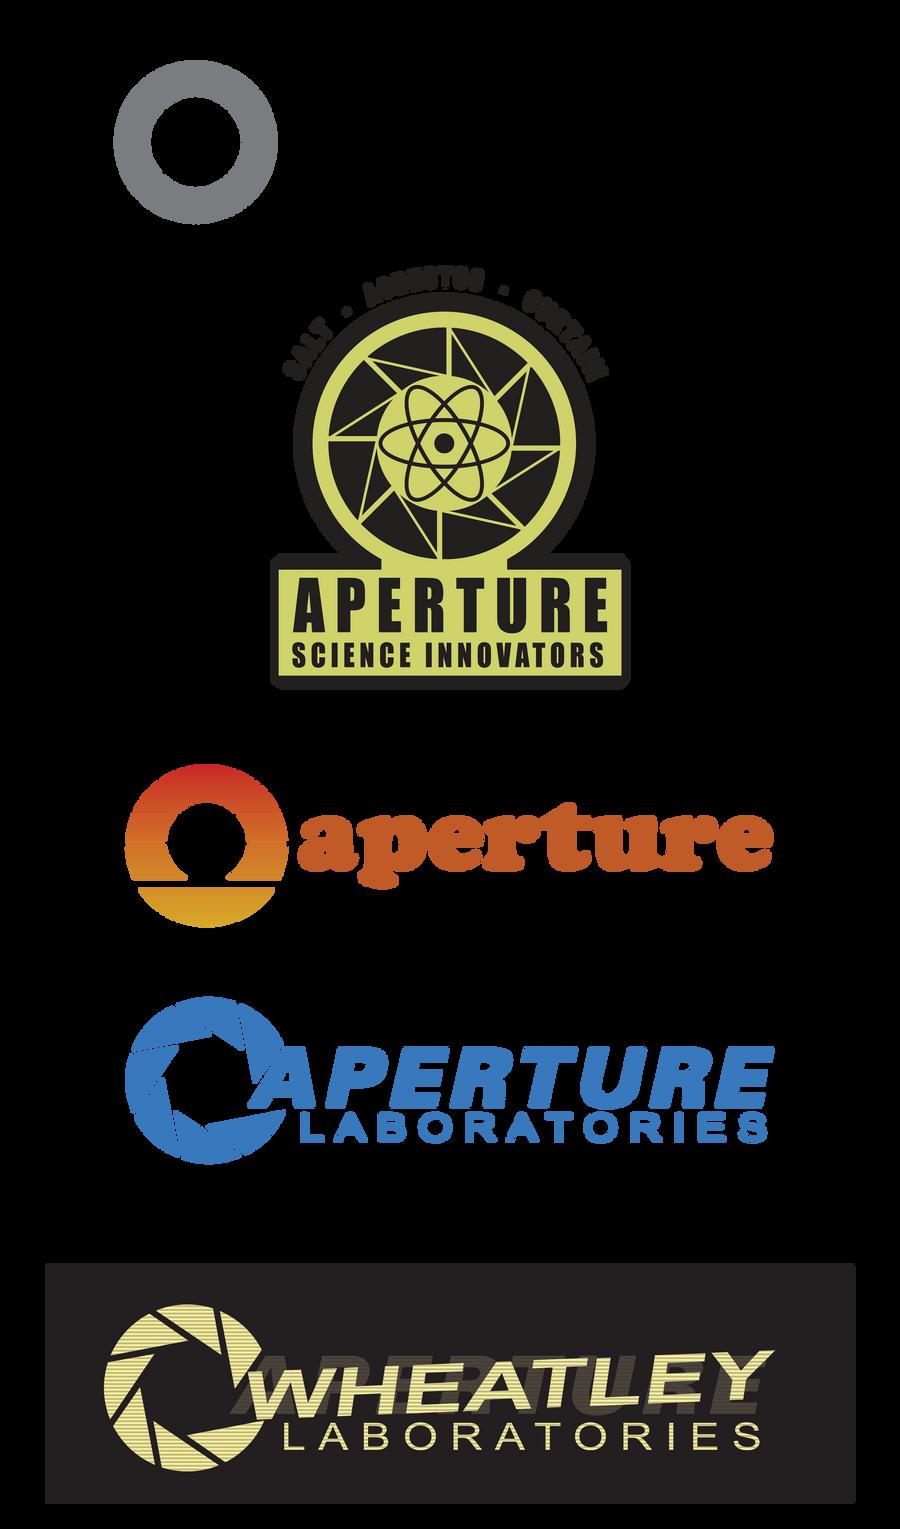 Aperture Through the Ages by GWBinvincible on DeviantArt Aperture Science Innovators Font